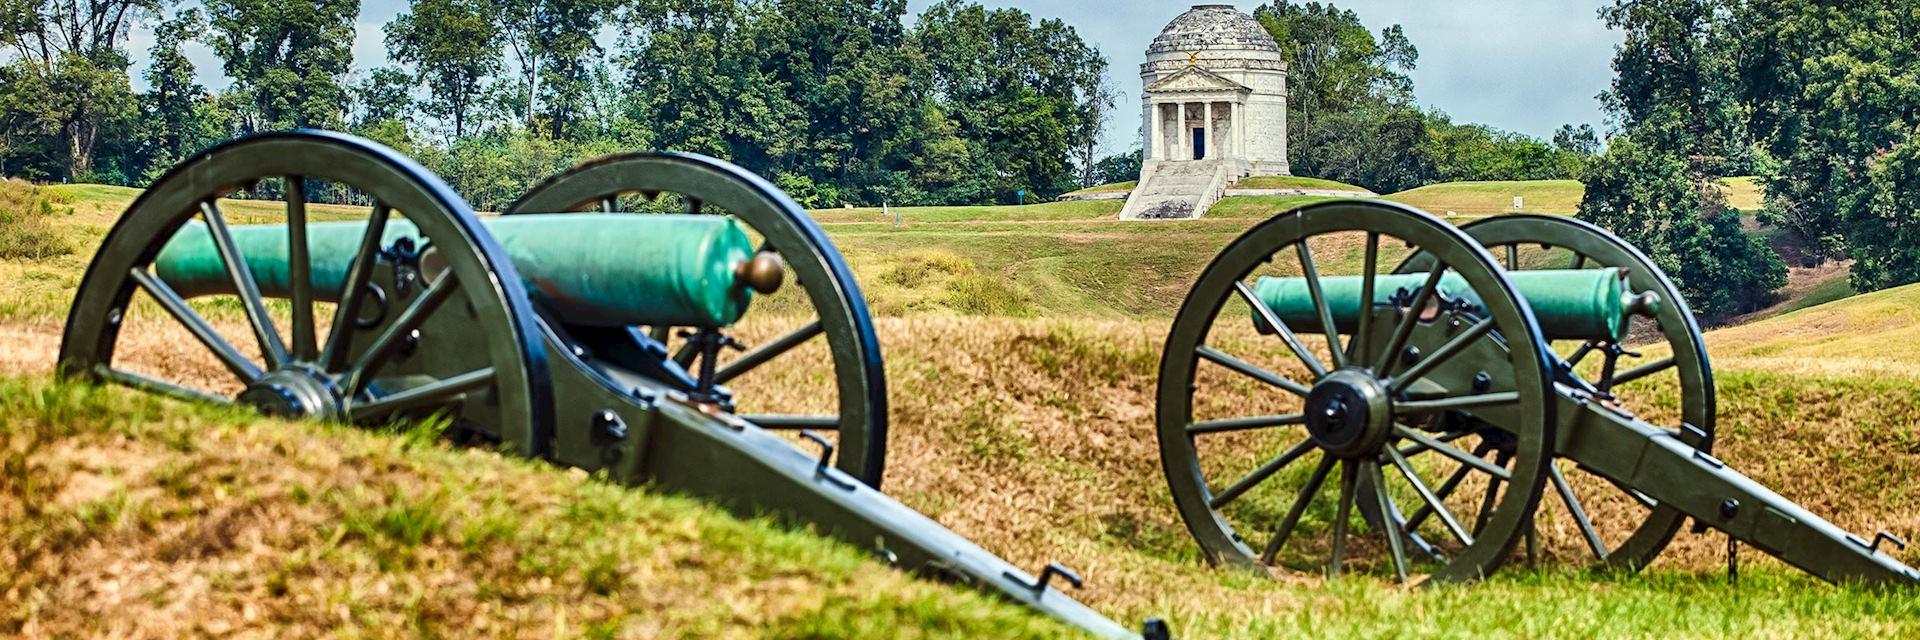 Vicksburg National Military Park, USA